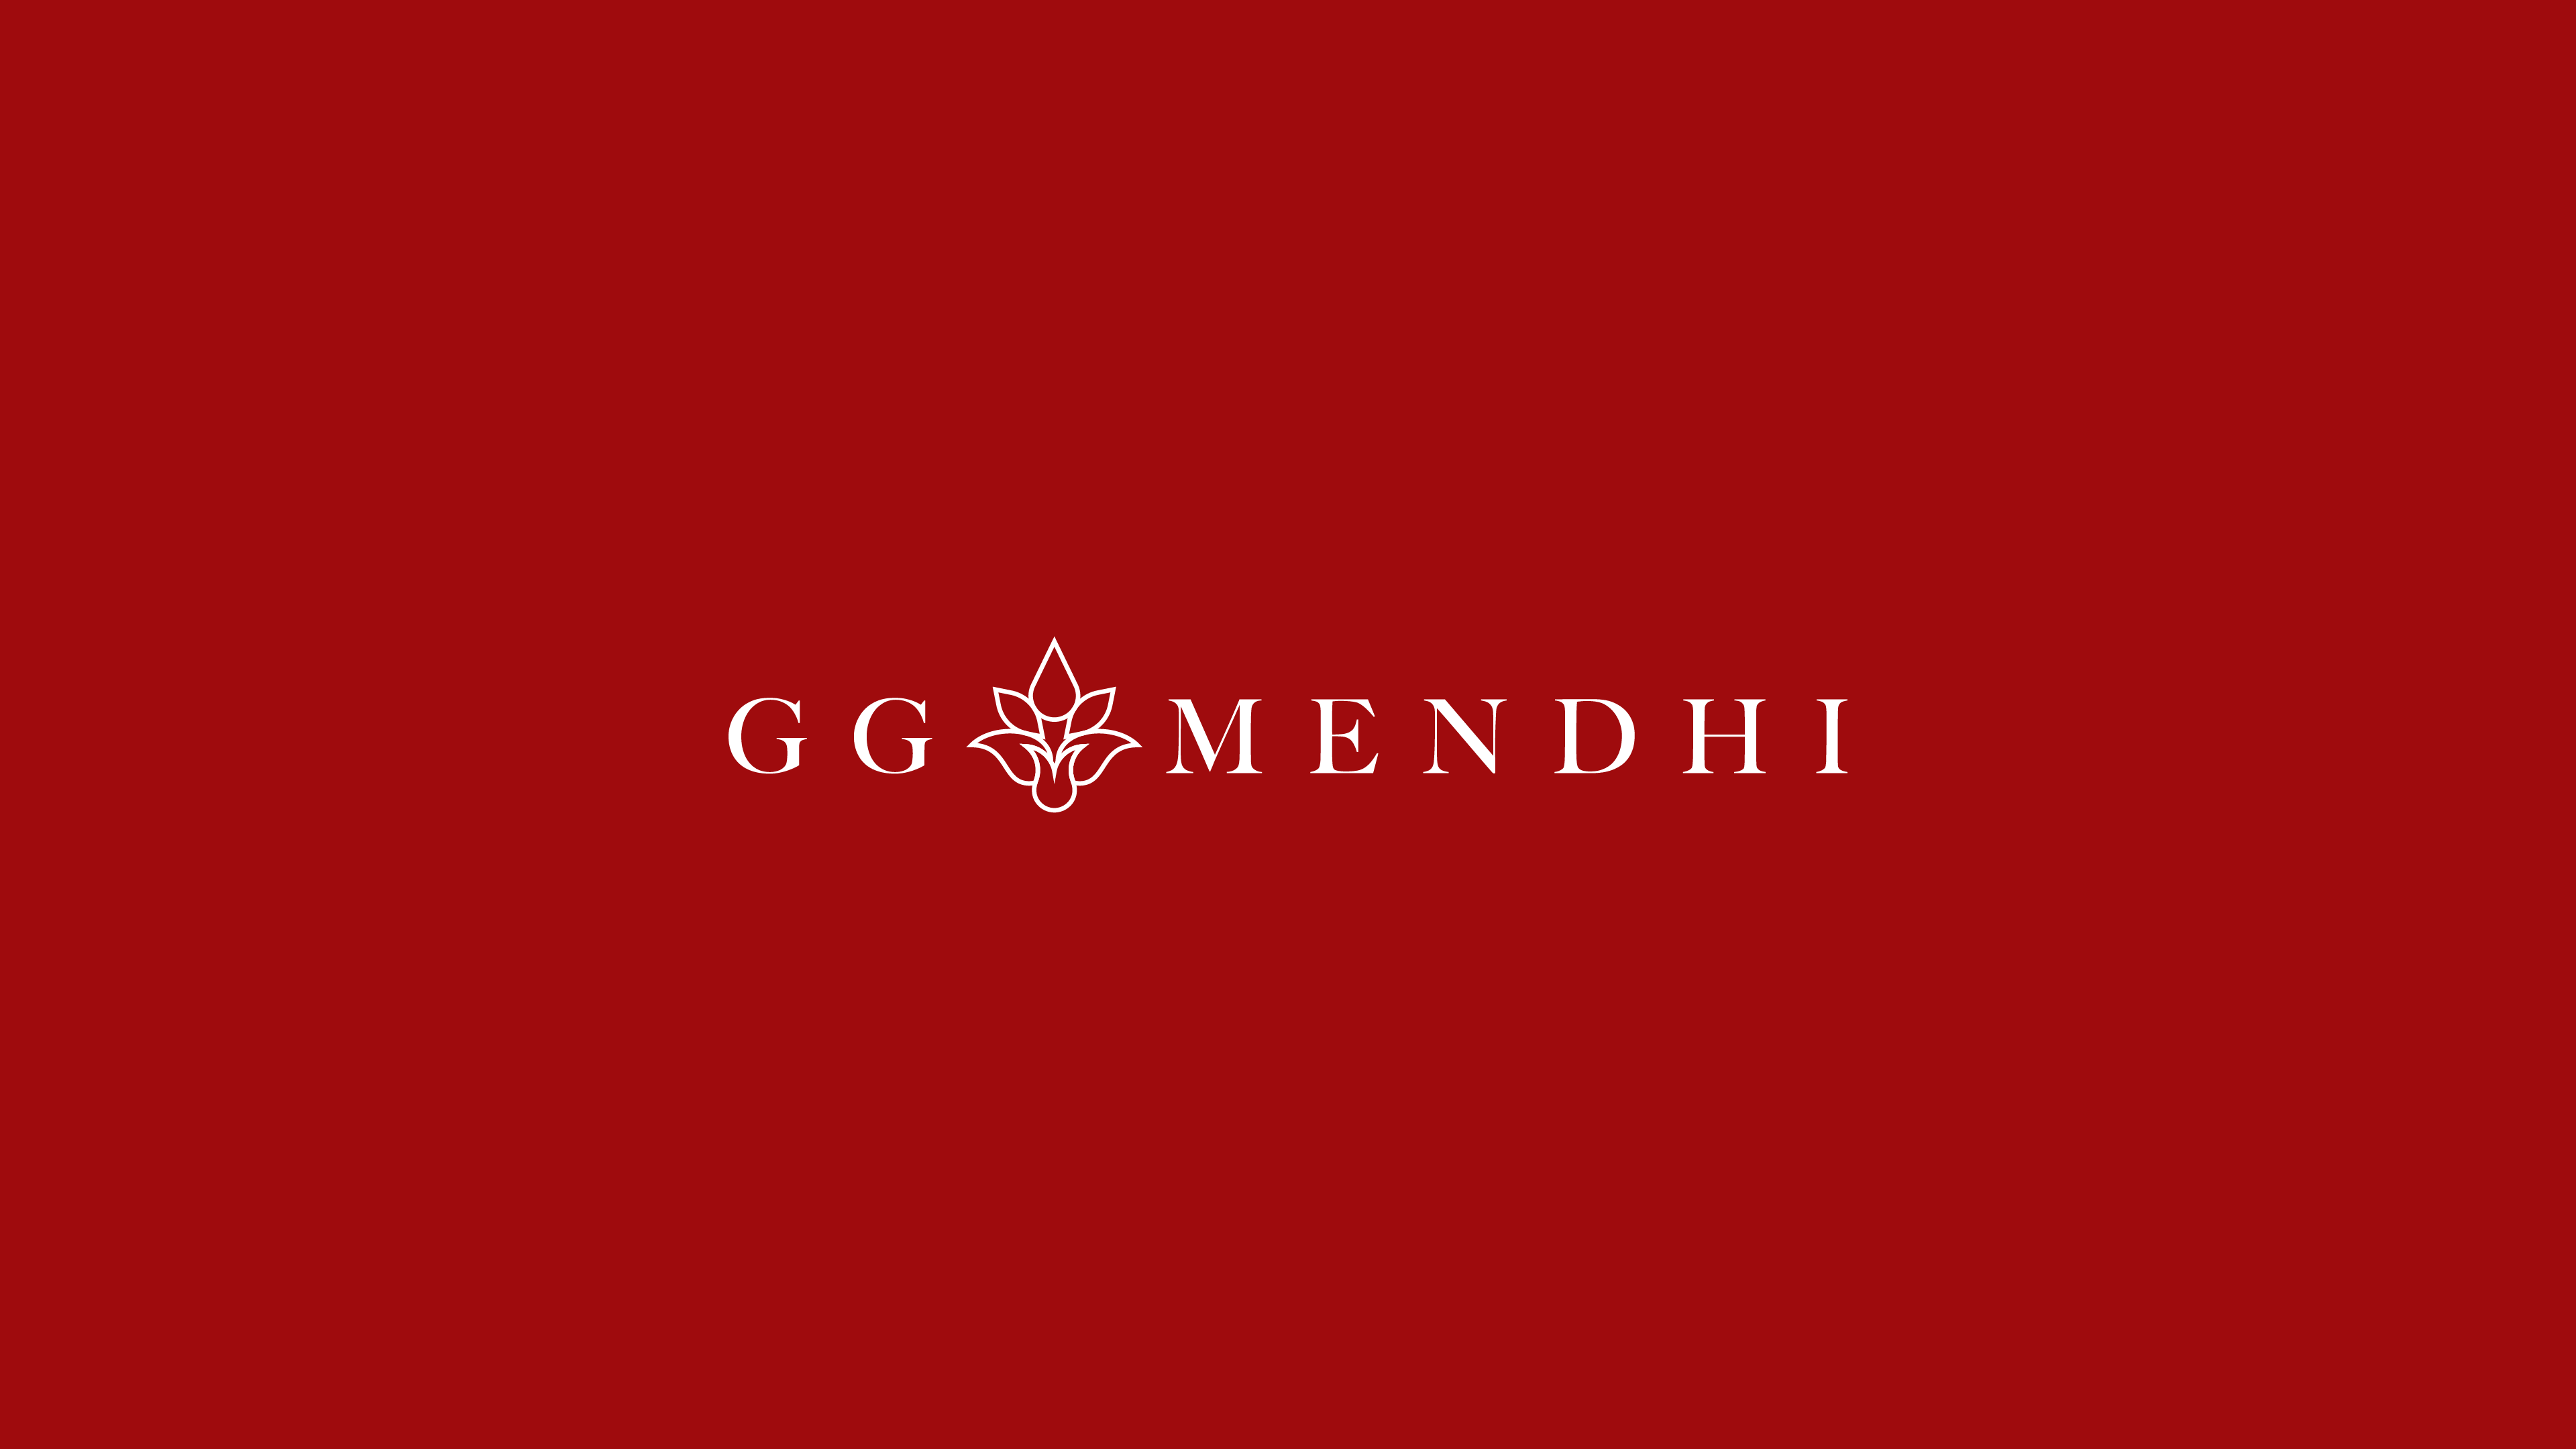 Manraj Ubhi - GG Mendhi Logo